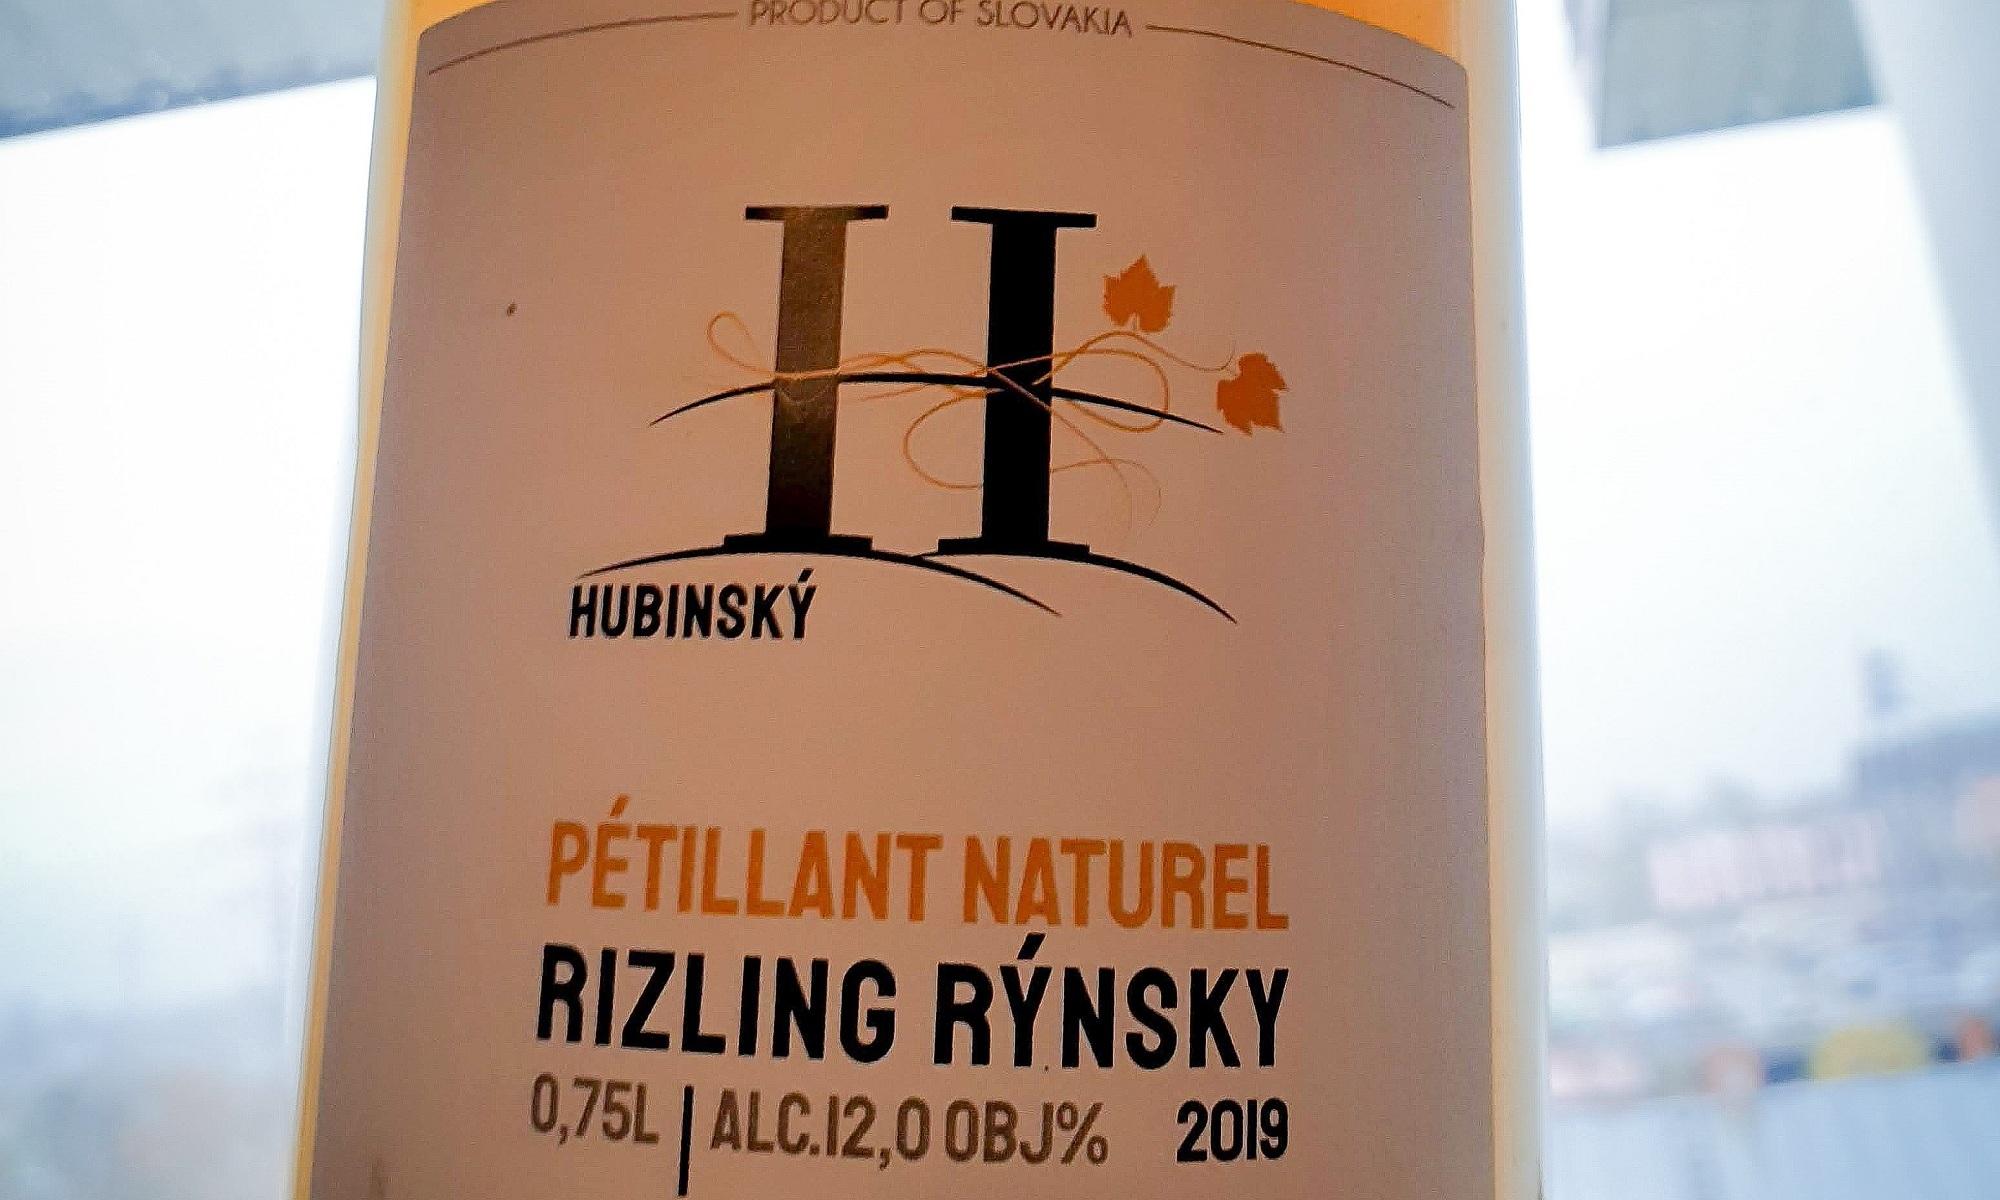 Hubinský Rizling Rýnsky Pétillant Naturel 2019